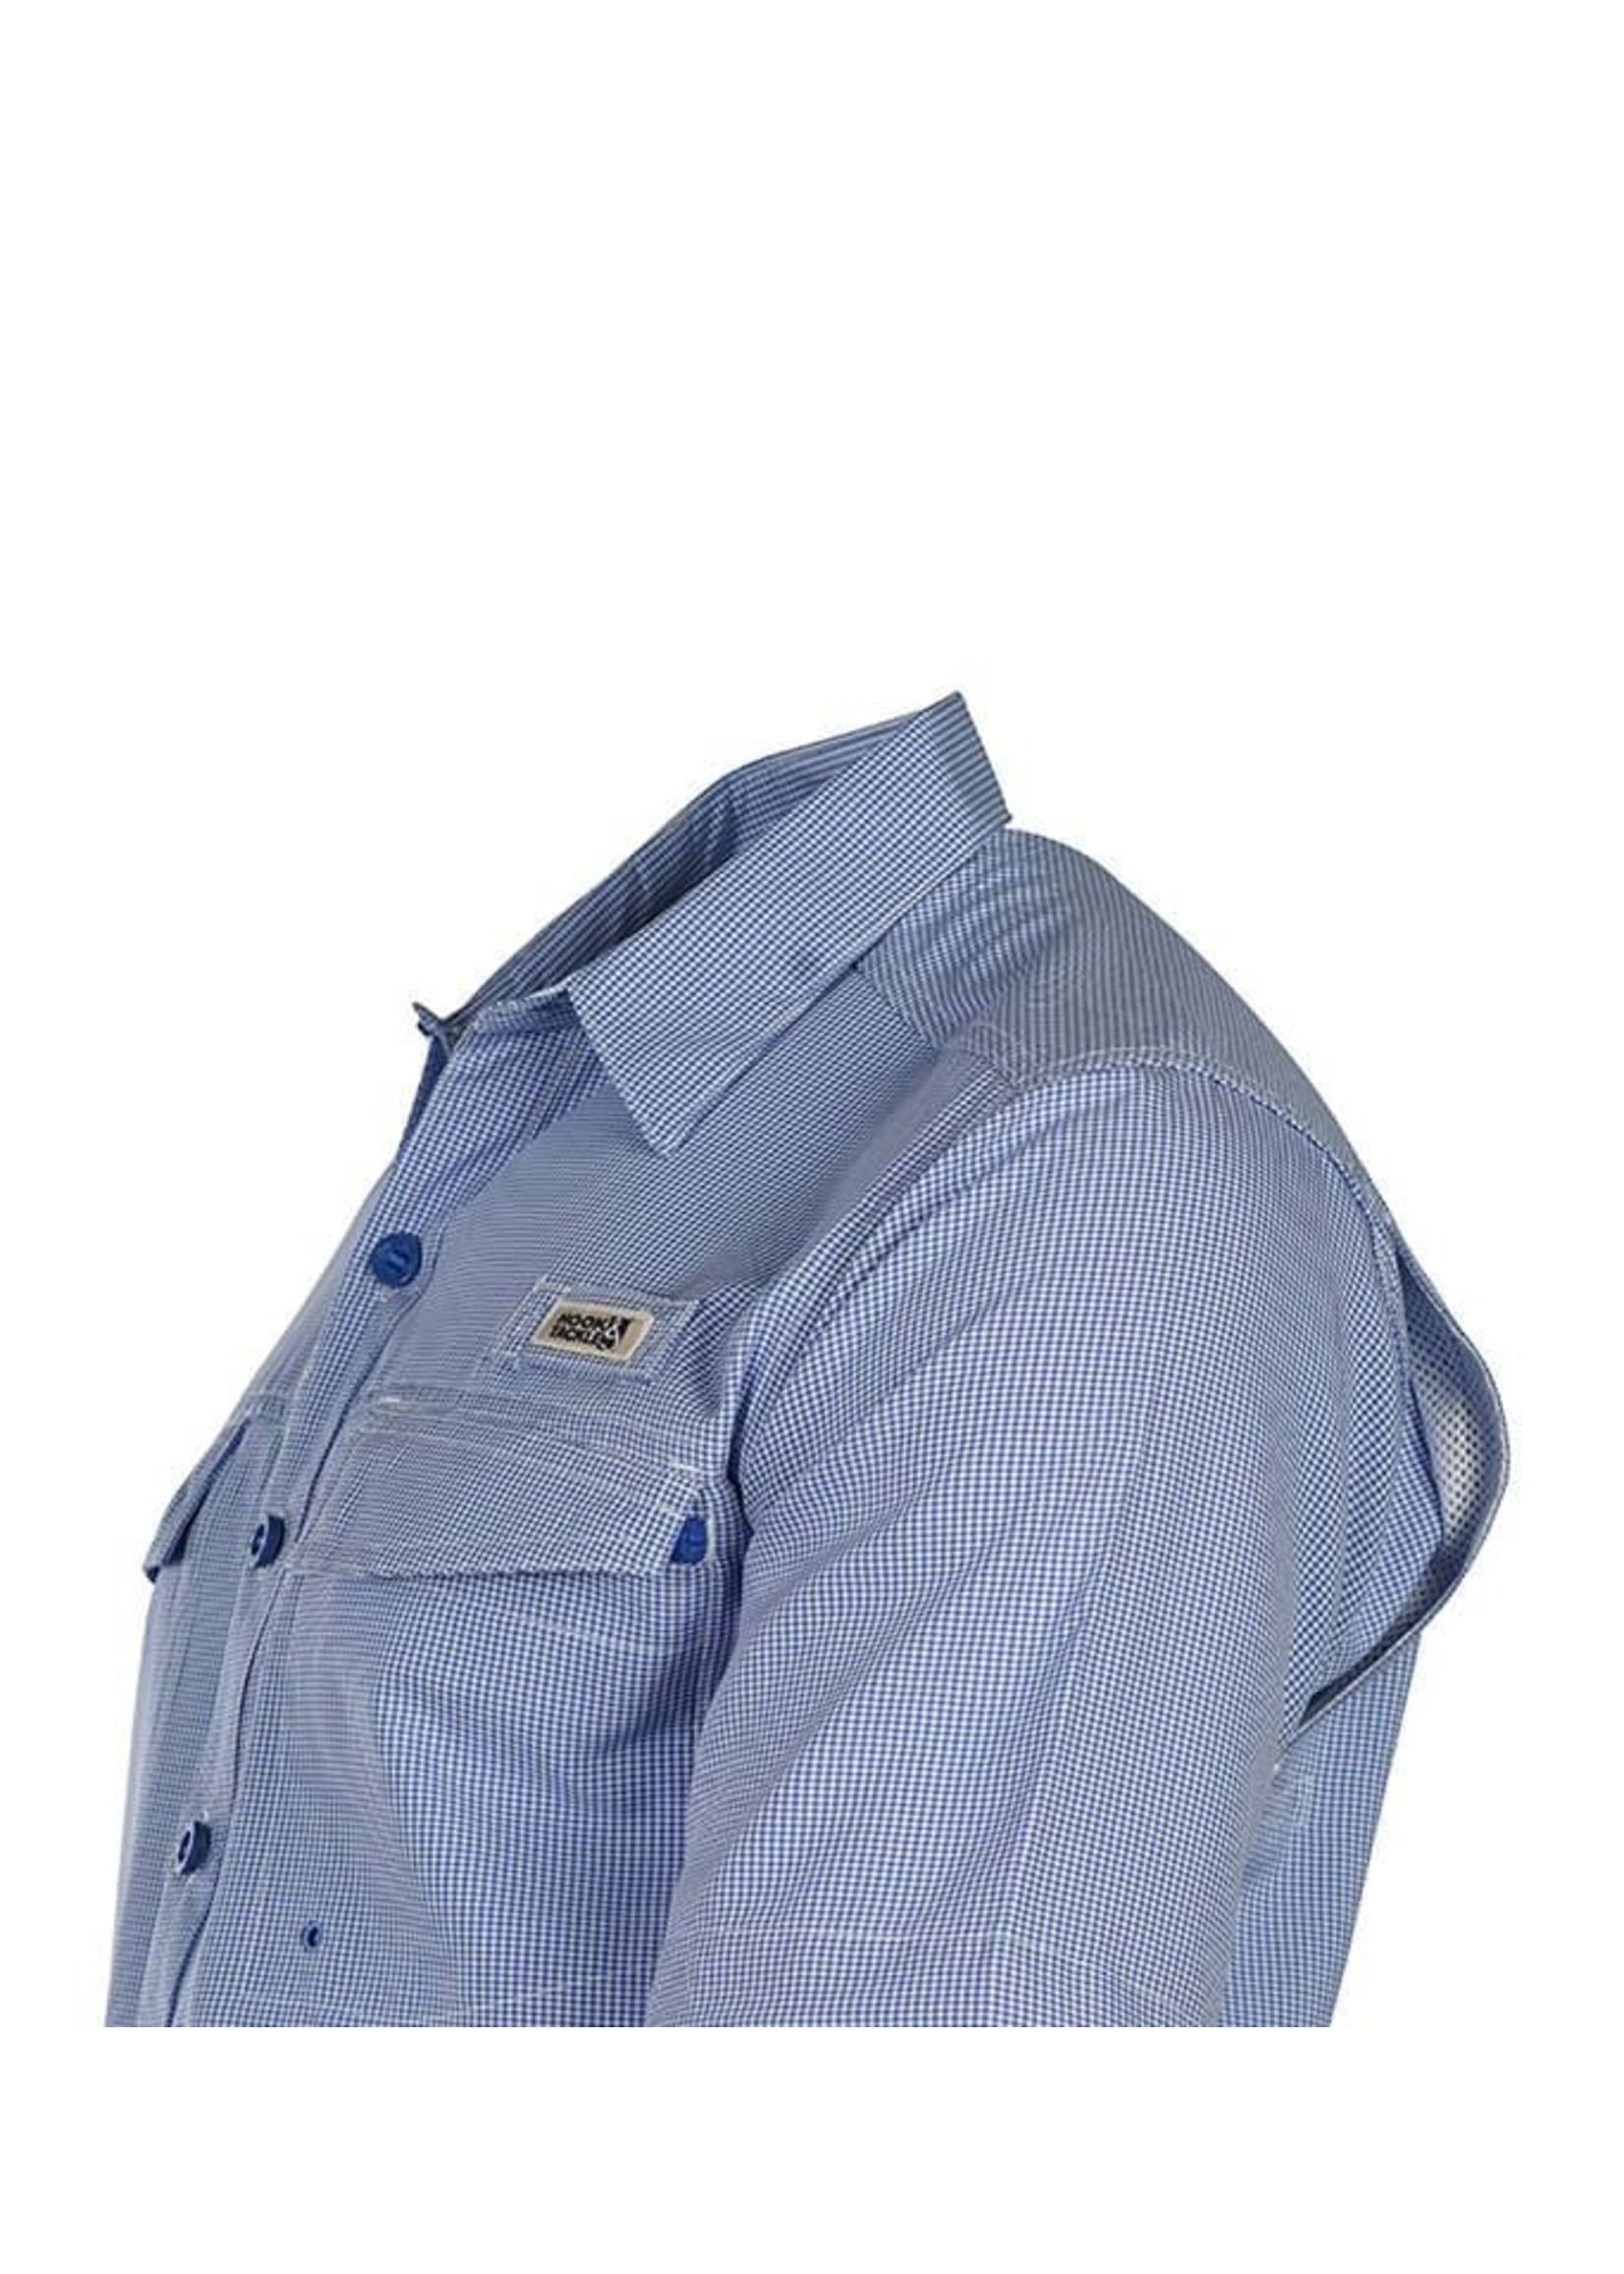 Hook & Tackle Men's Check Mate S/S UV Vented Fishing Shirt